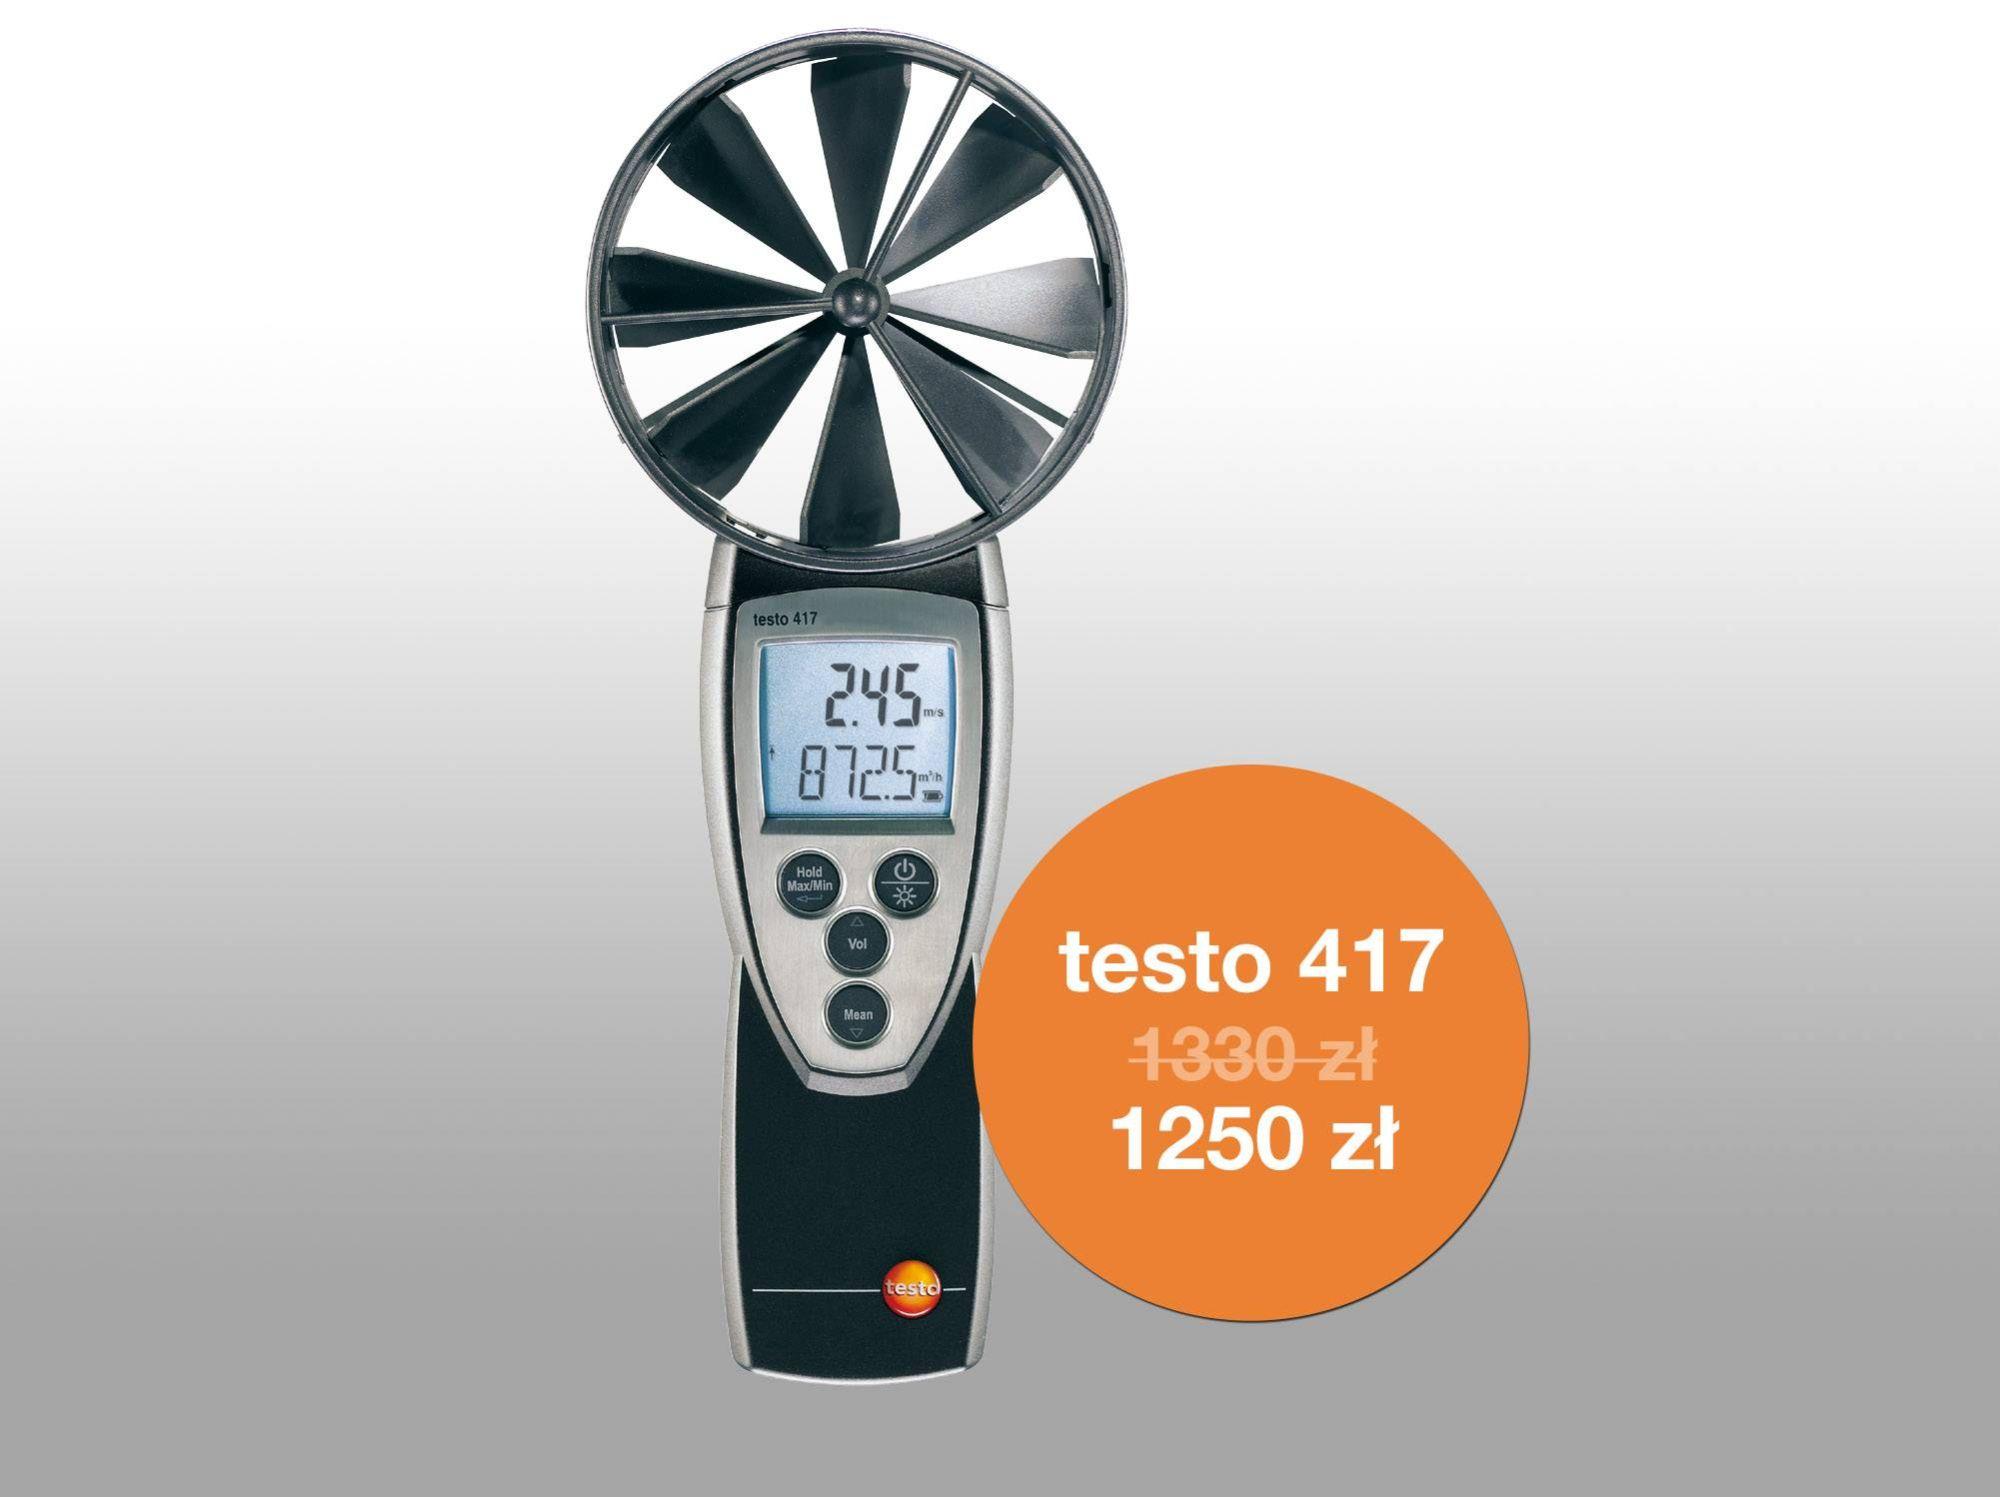 testo-417-anemometer (2).jpg